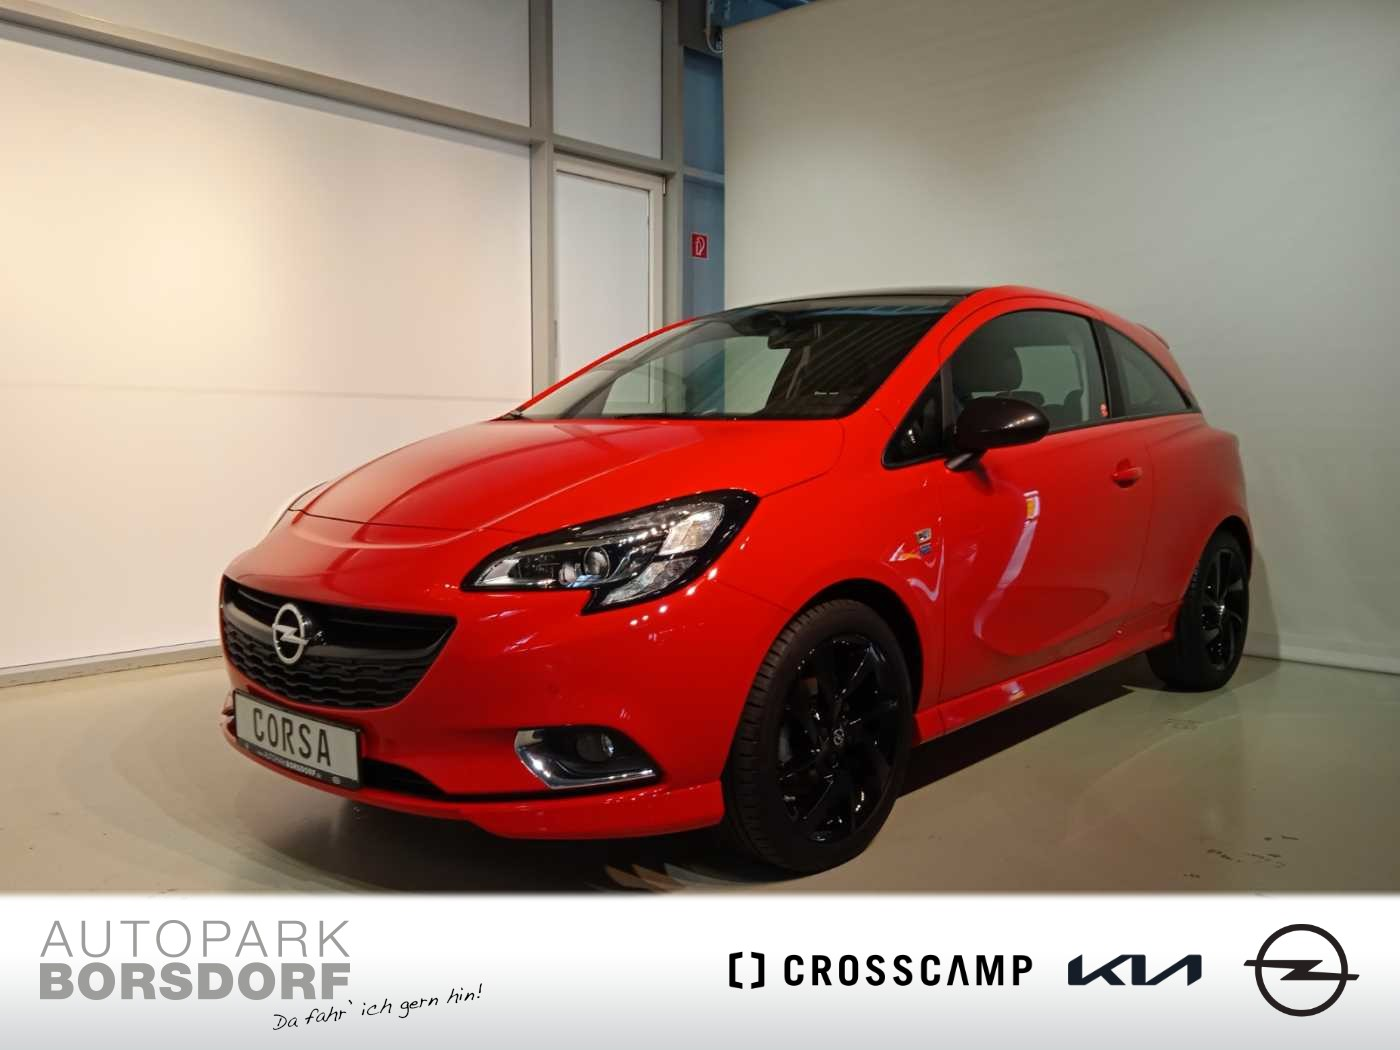 Opel Corsa 1.4 Turbo OPC Line*S/S*6G*3T*DAB+, Jahr 2019, Benzin